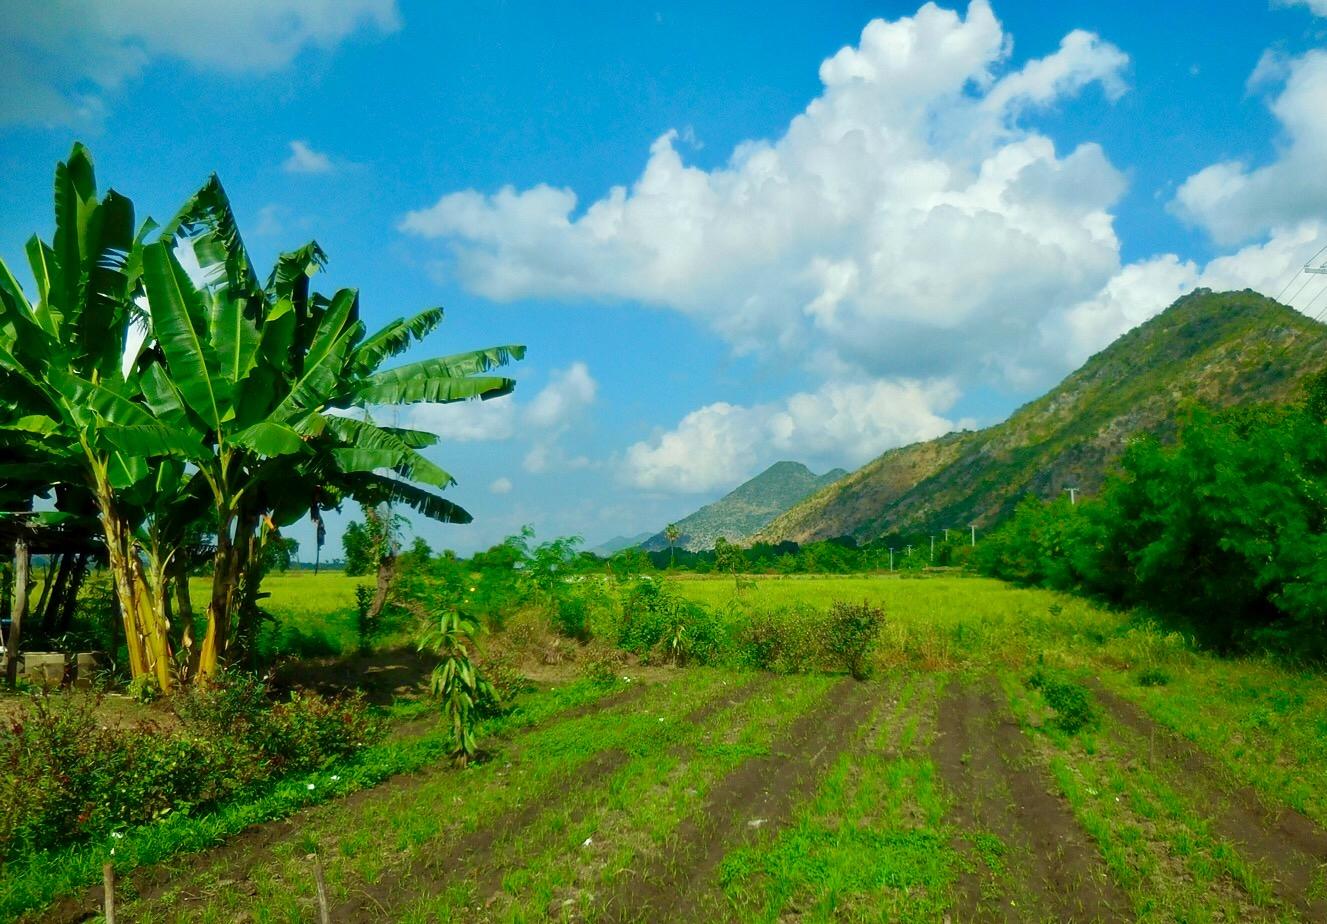 Üppige Landschaft in Myanmar/Burma